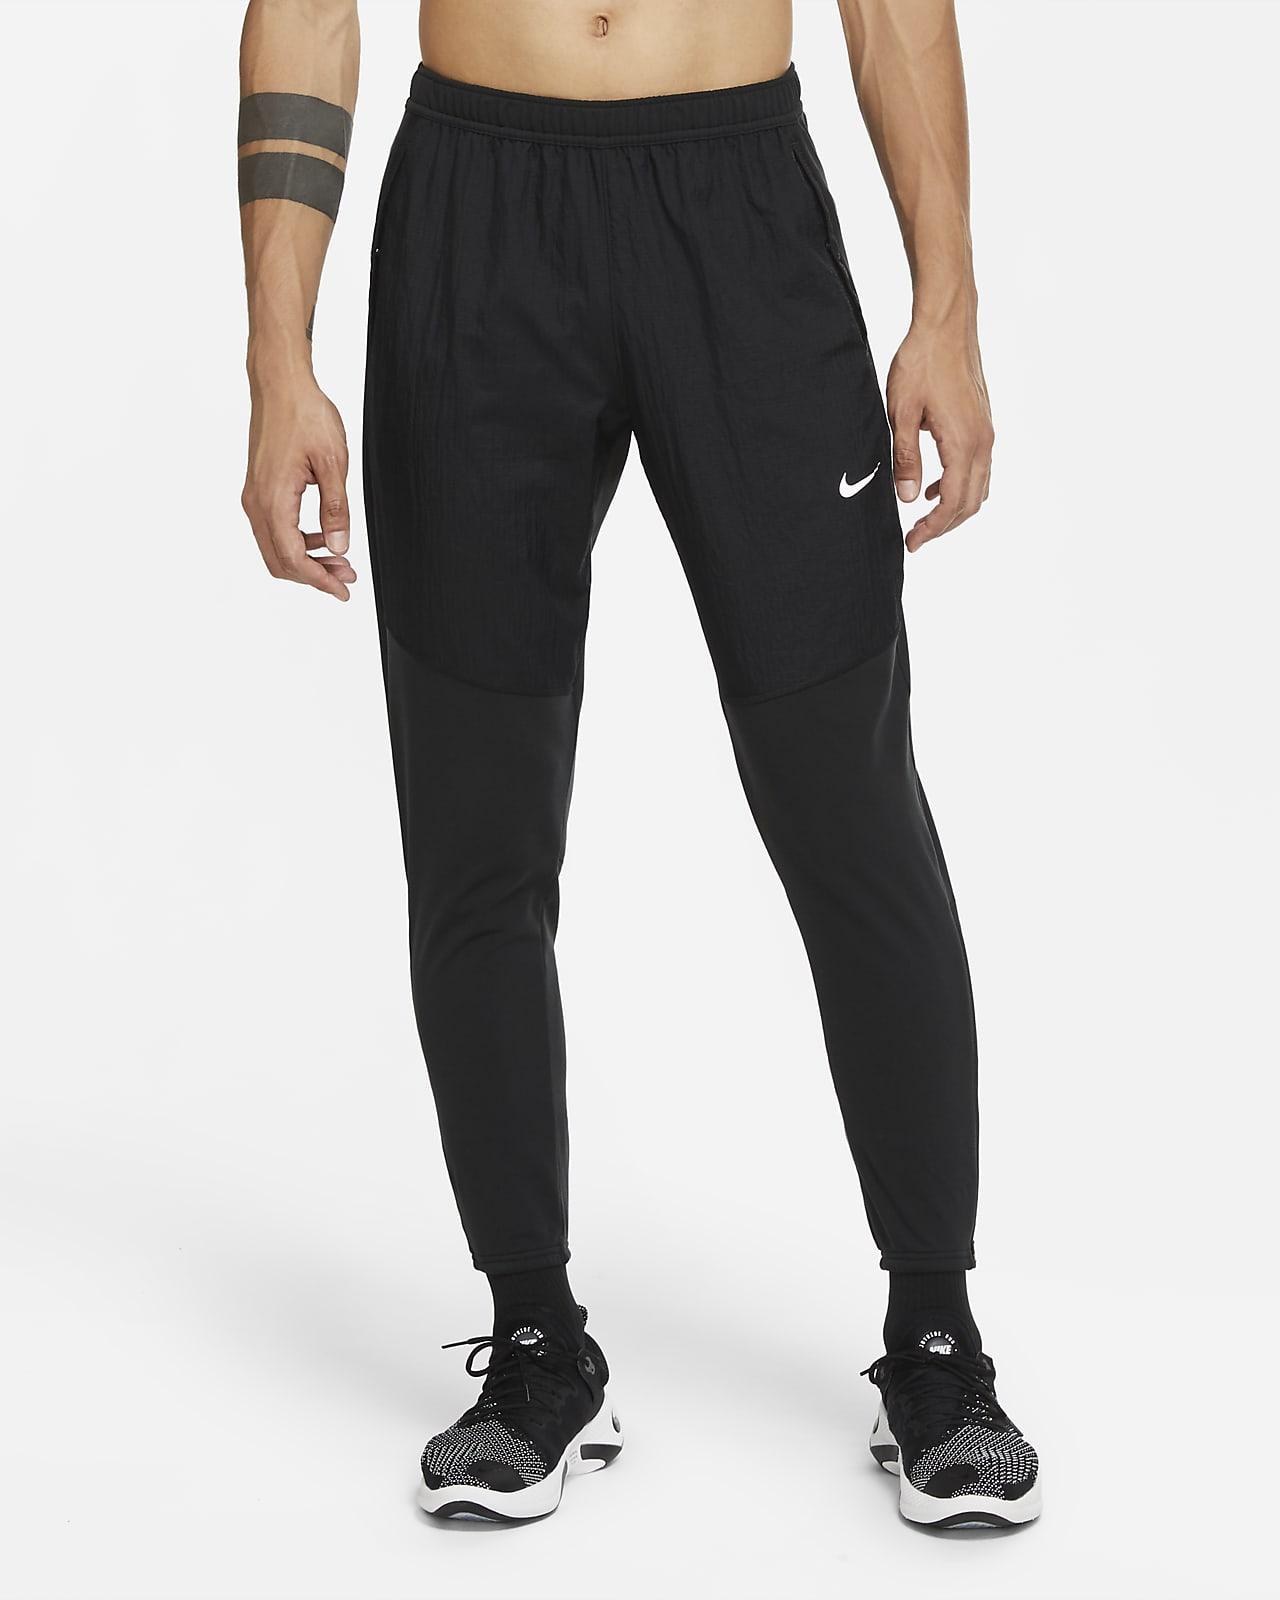 Pantalon de running Nike Therma Essential pour Homme